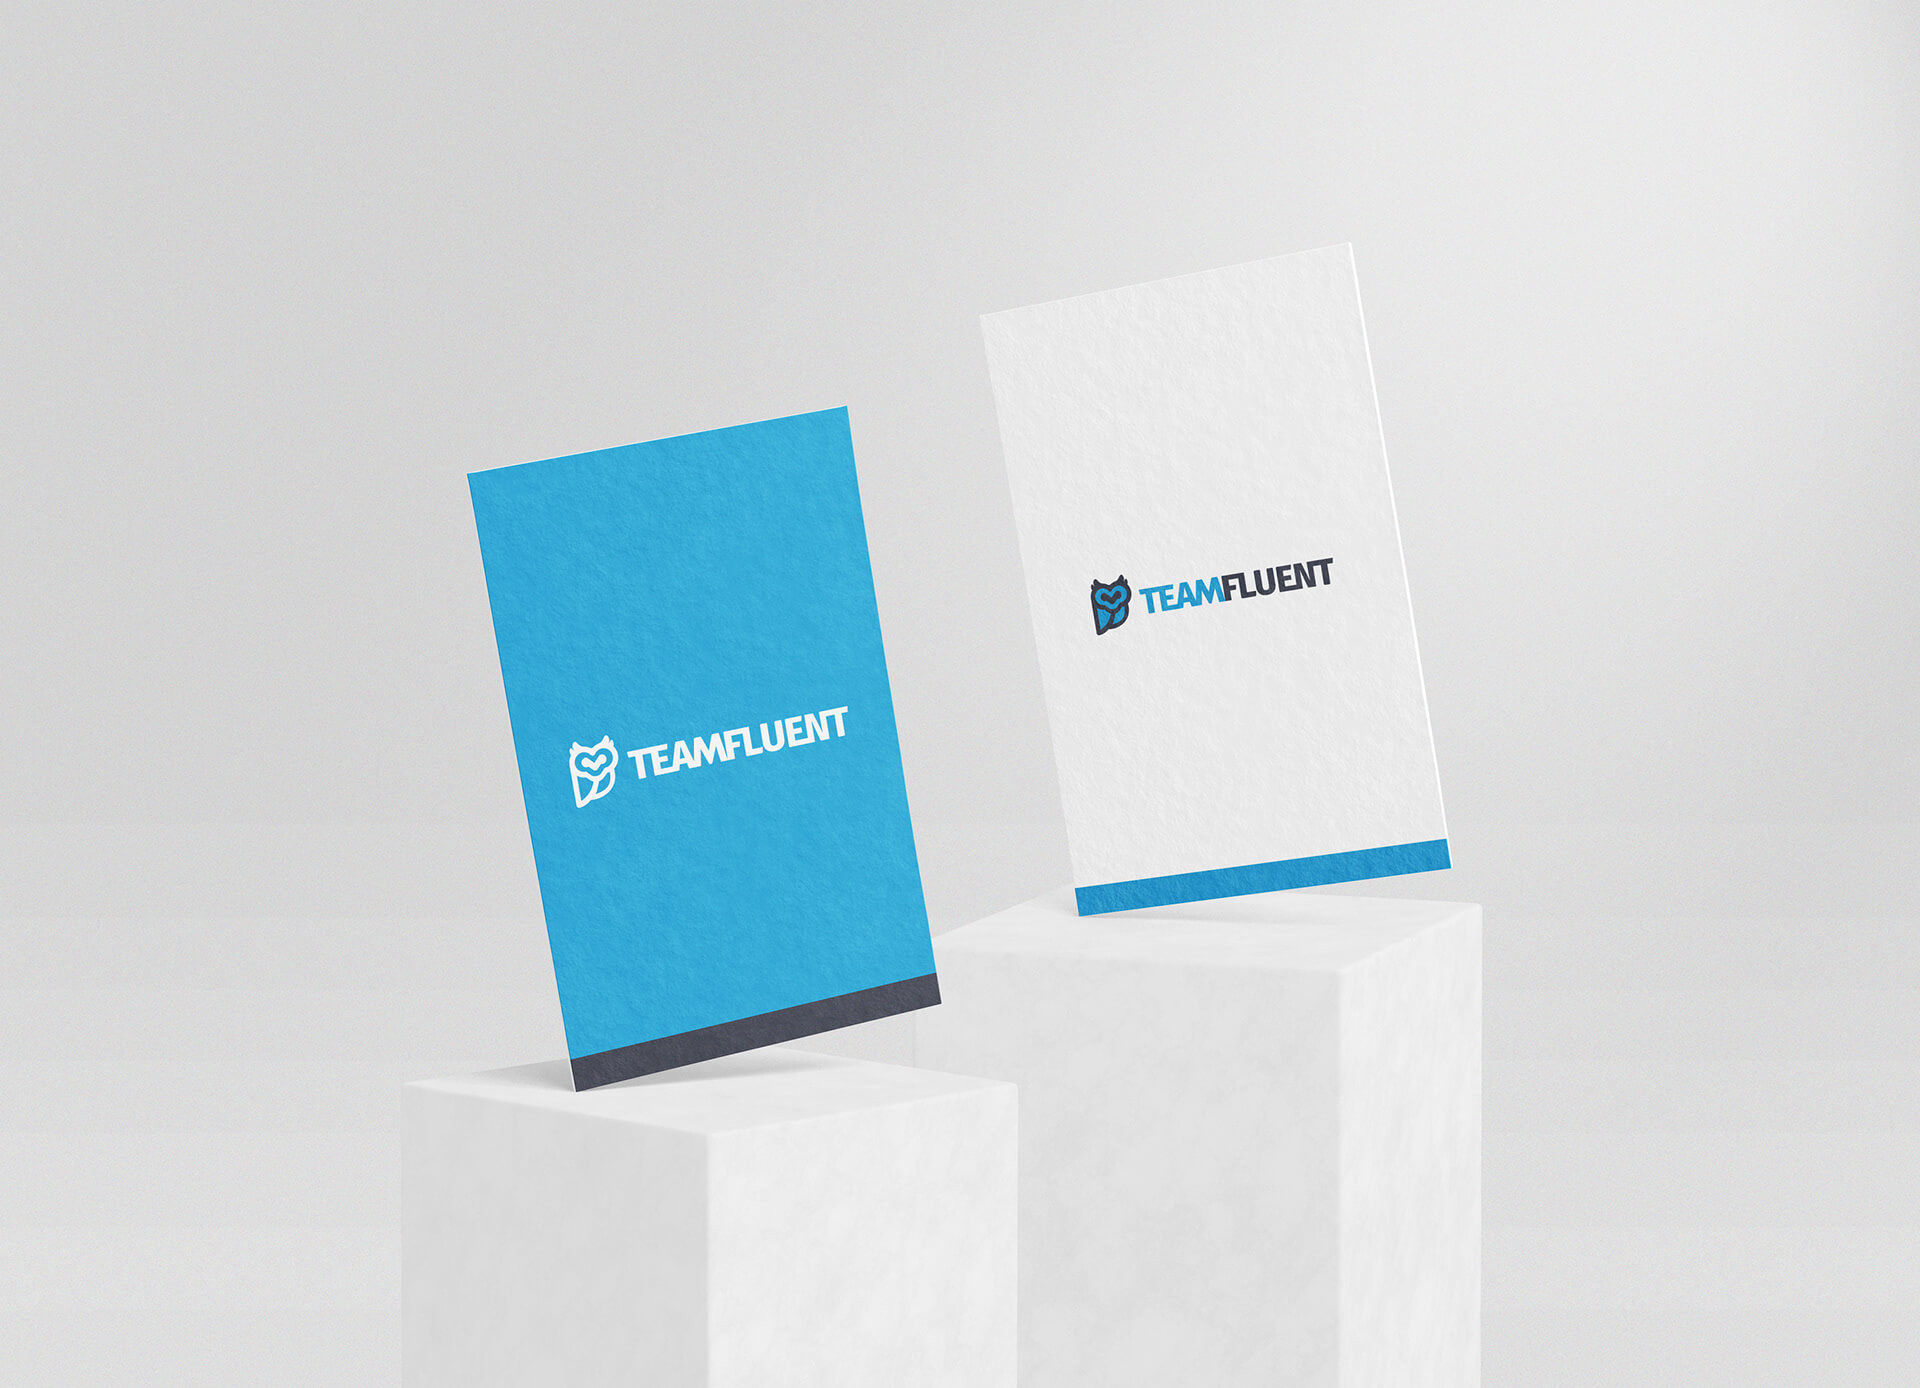 teamfluent-business-cards